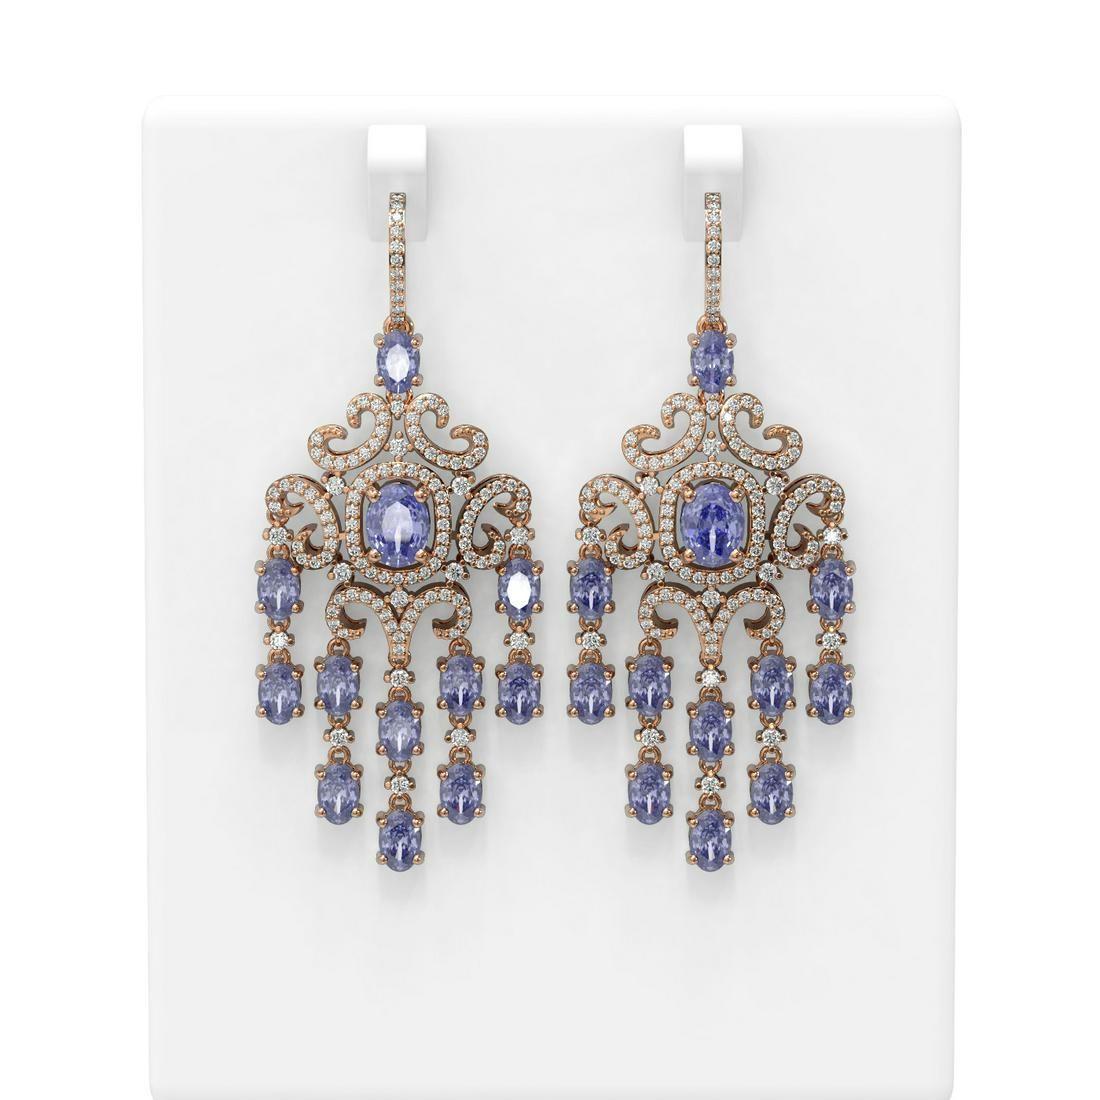 19.07 ctw Tanzanite & Diamond Earrings 18K Rose Gold -